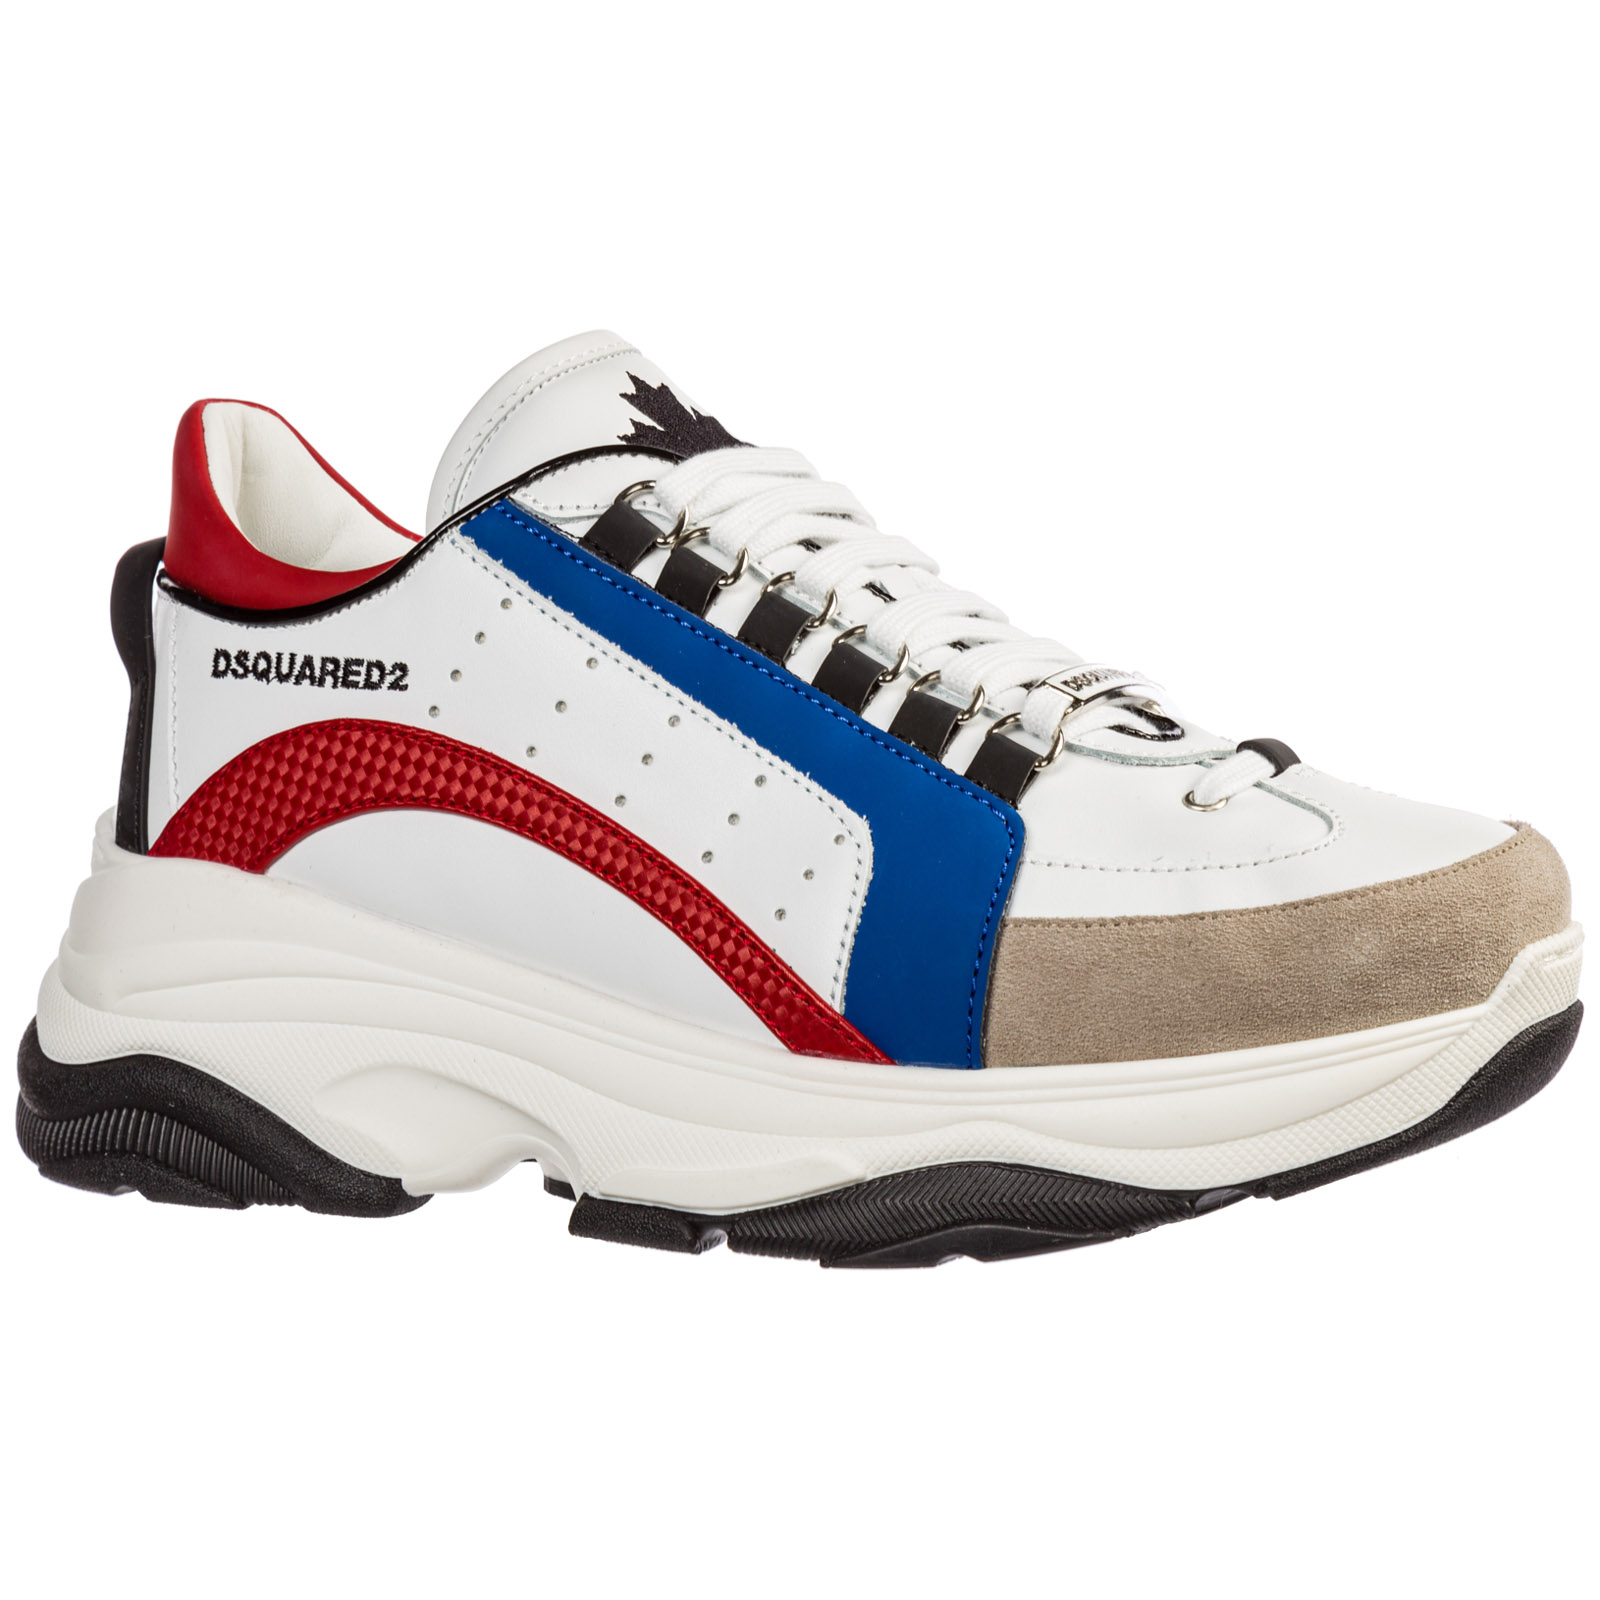 8df2e0767 Chaussures baskets sneakers homme en cuir bumpy